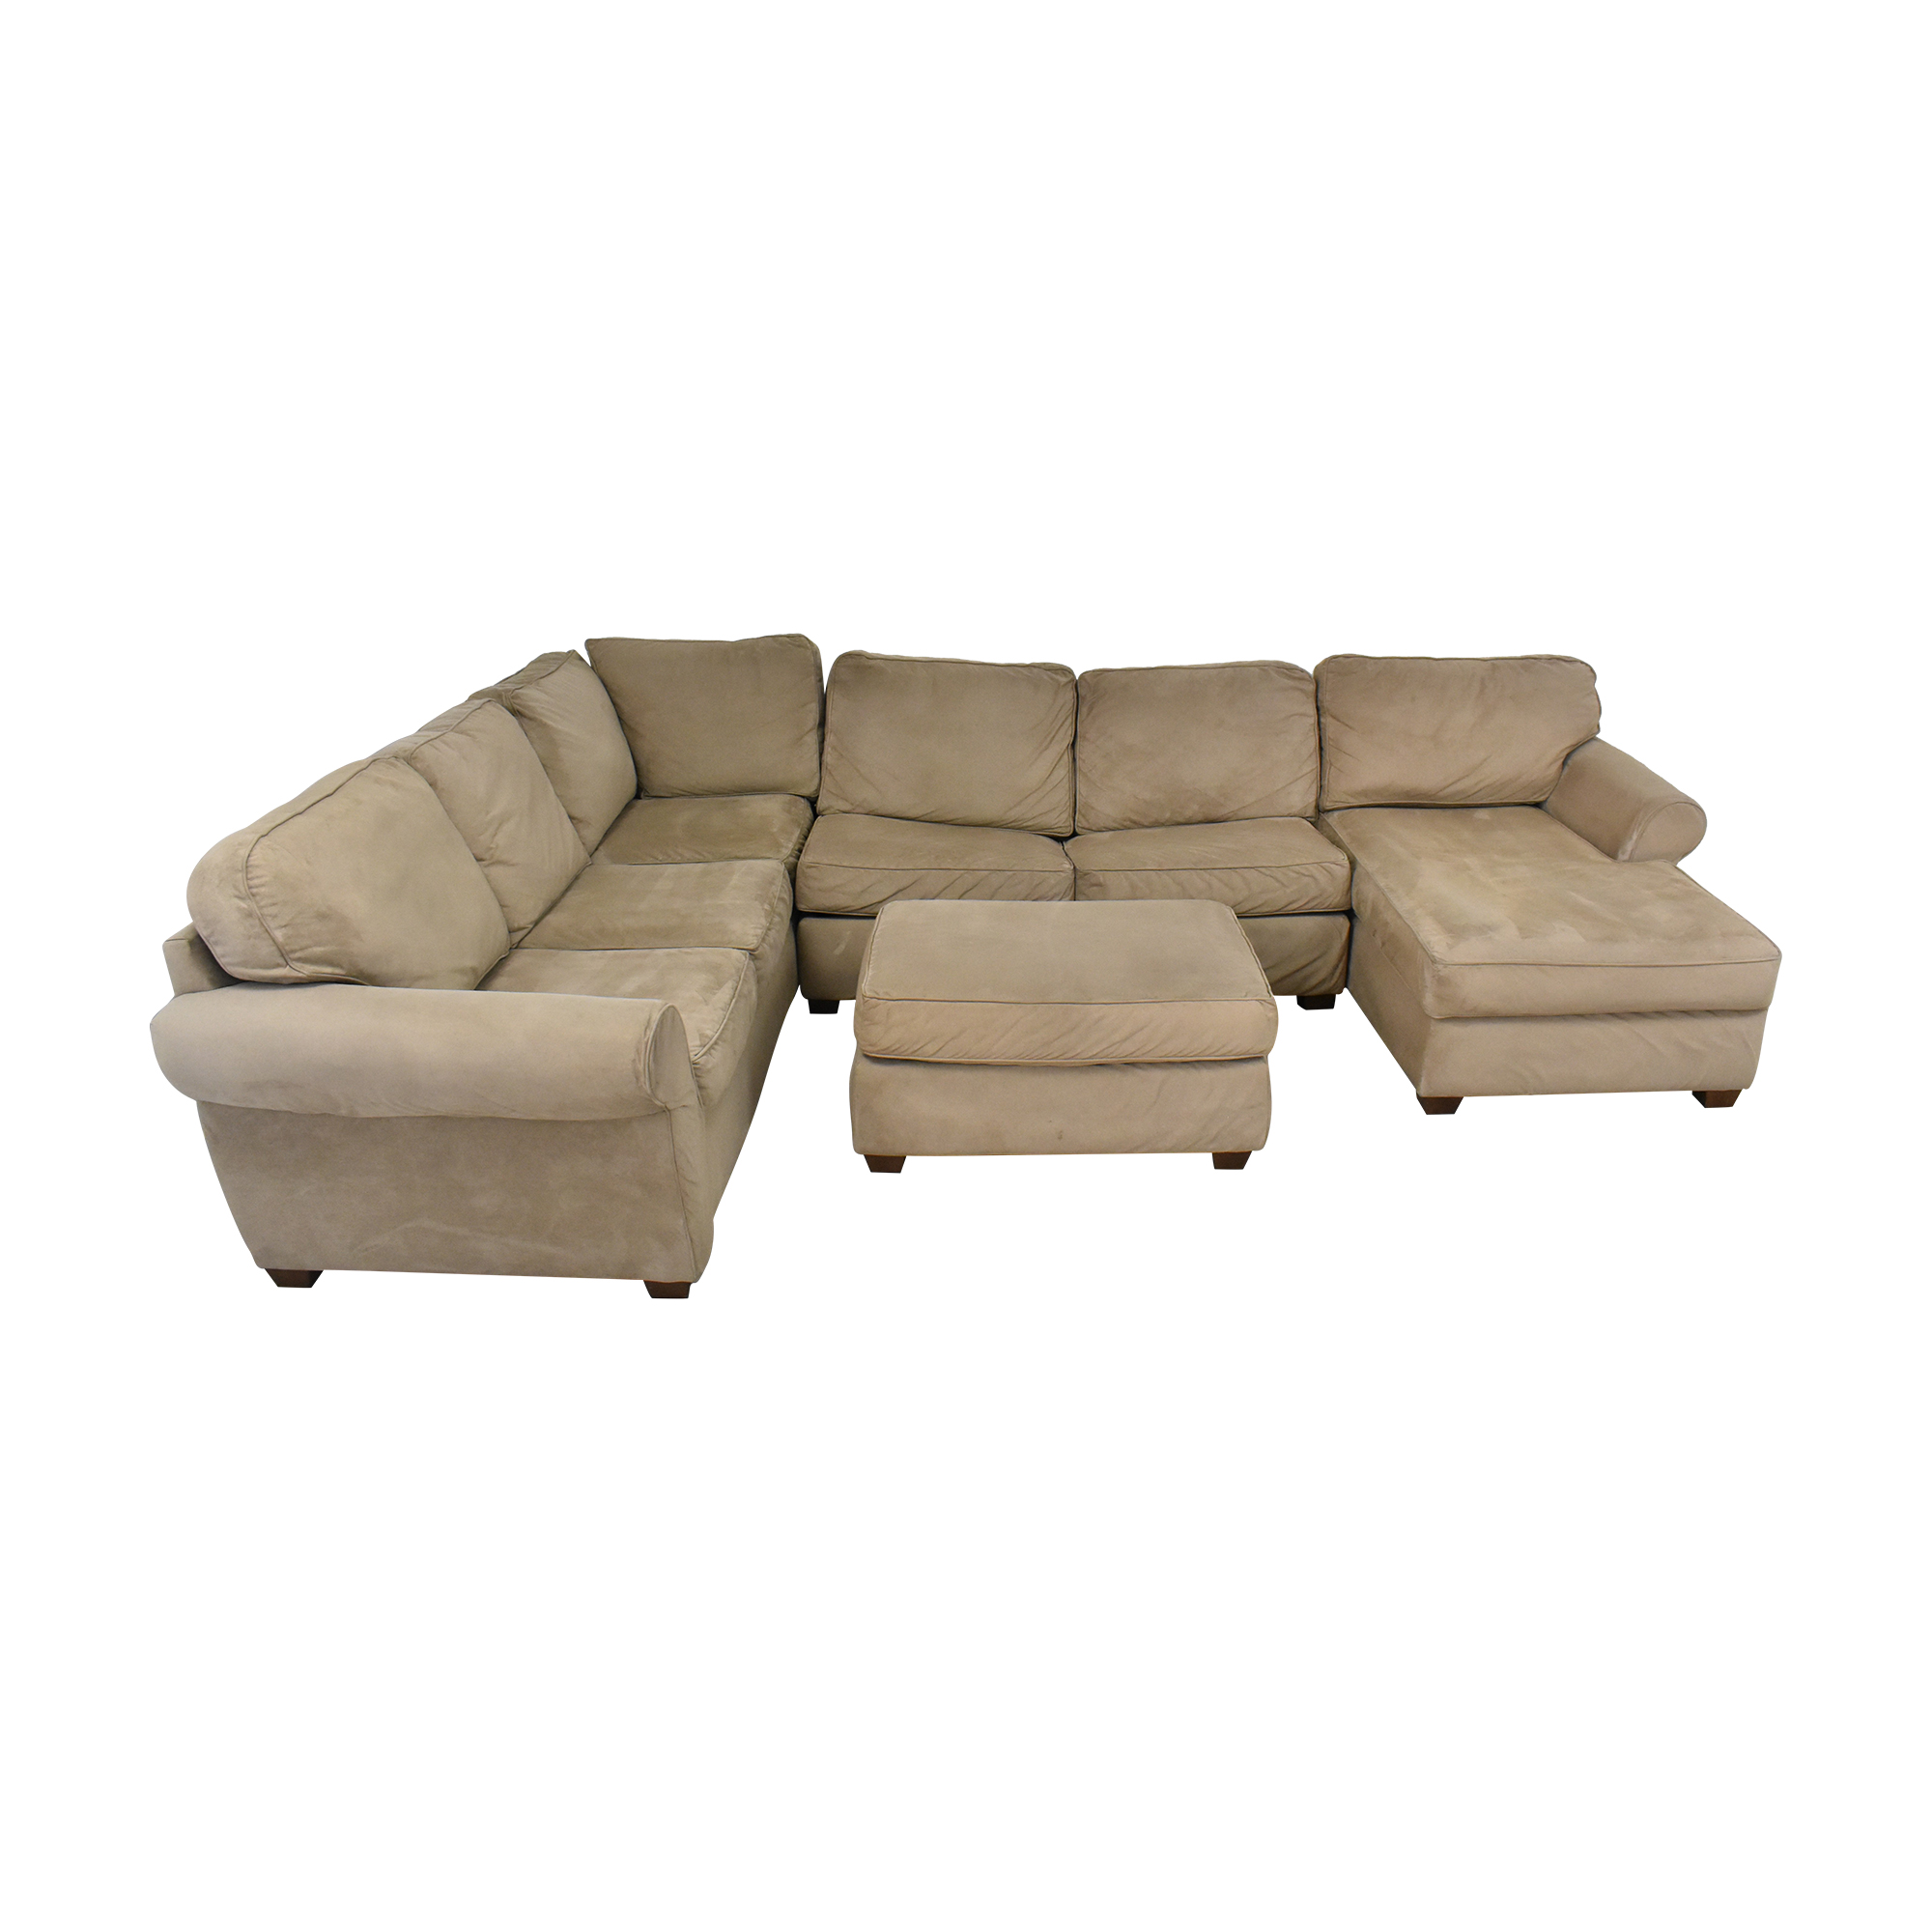 Macy's Macy's Chaise Sectional Sleeper Sofa with Ottoman ma